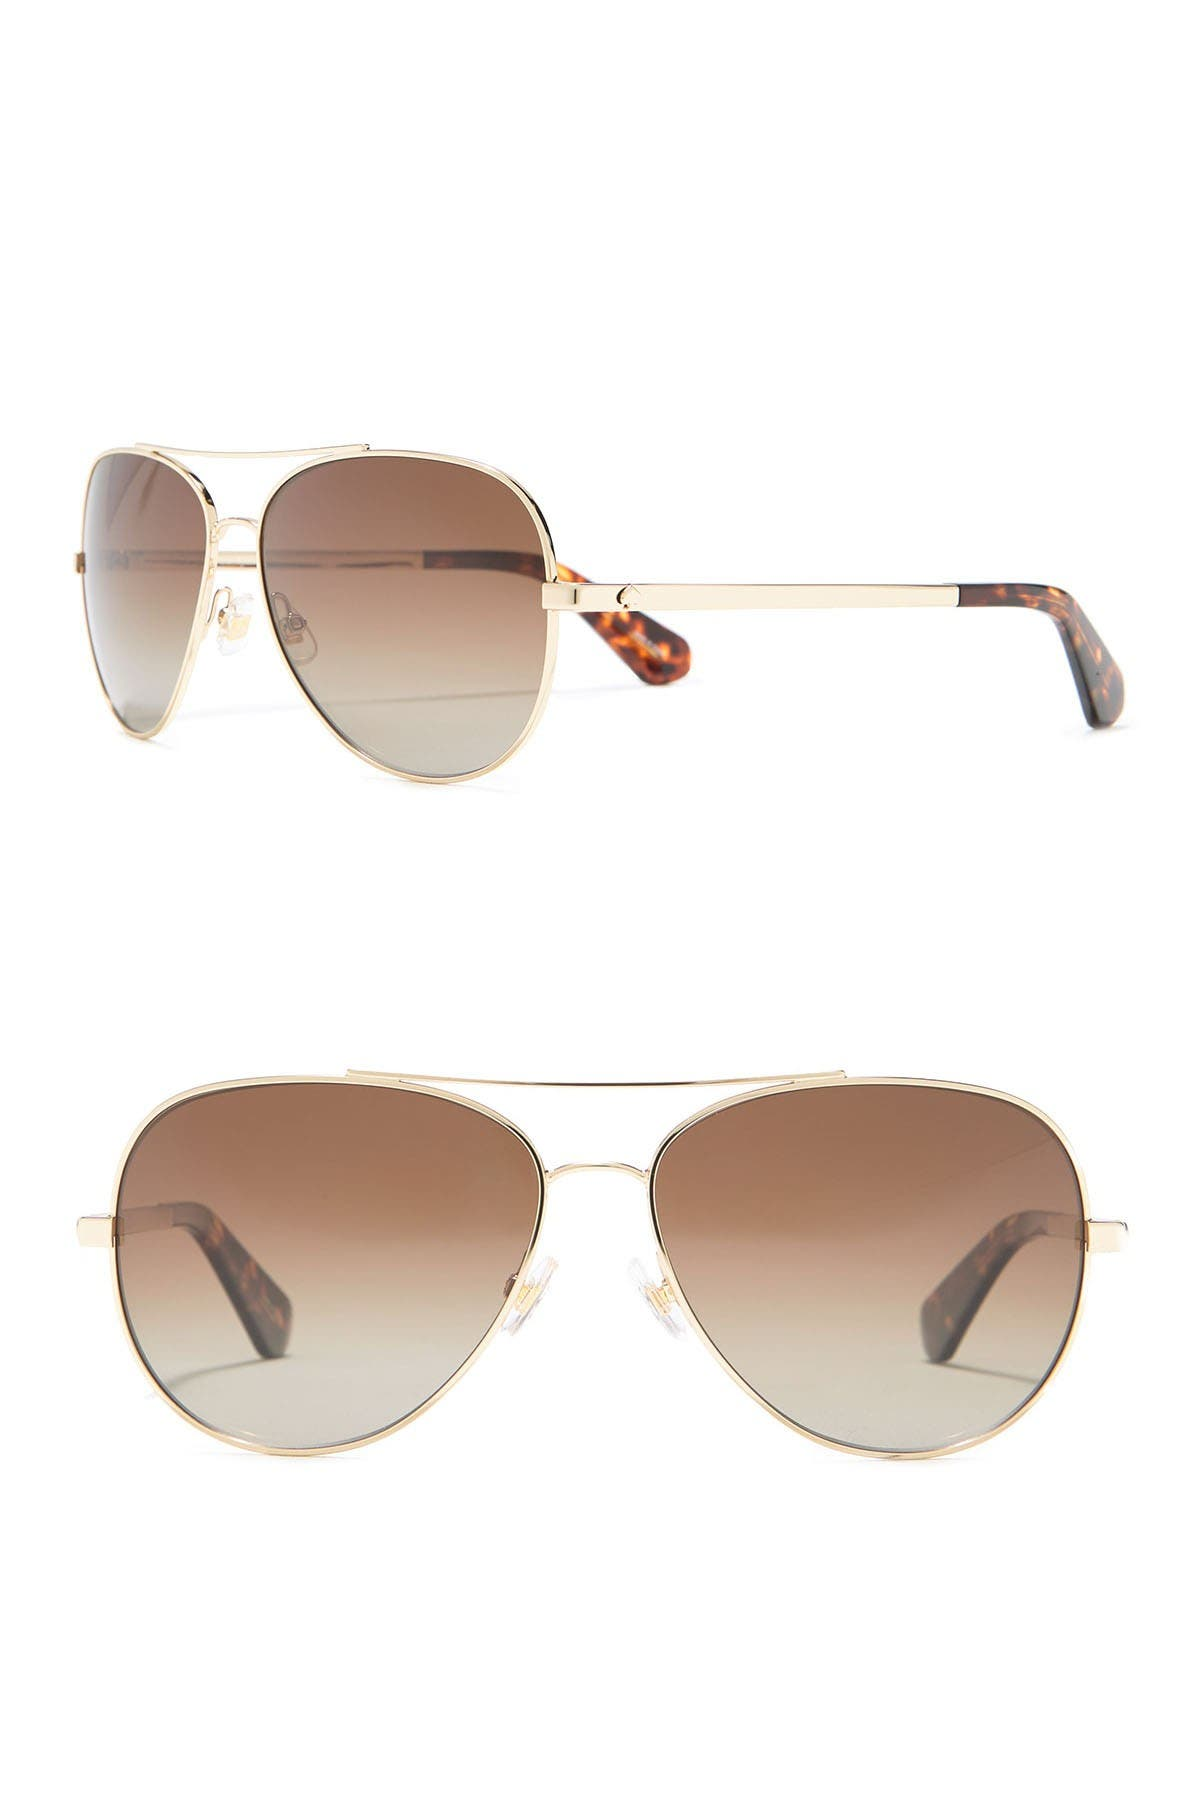 Image of kate spade new york avaline 58mm aviator sunglasses